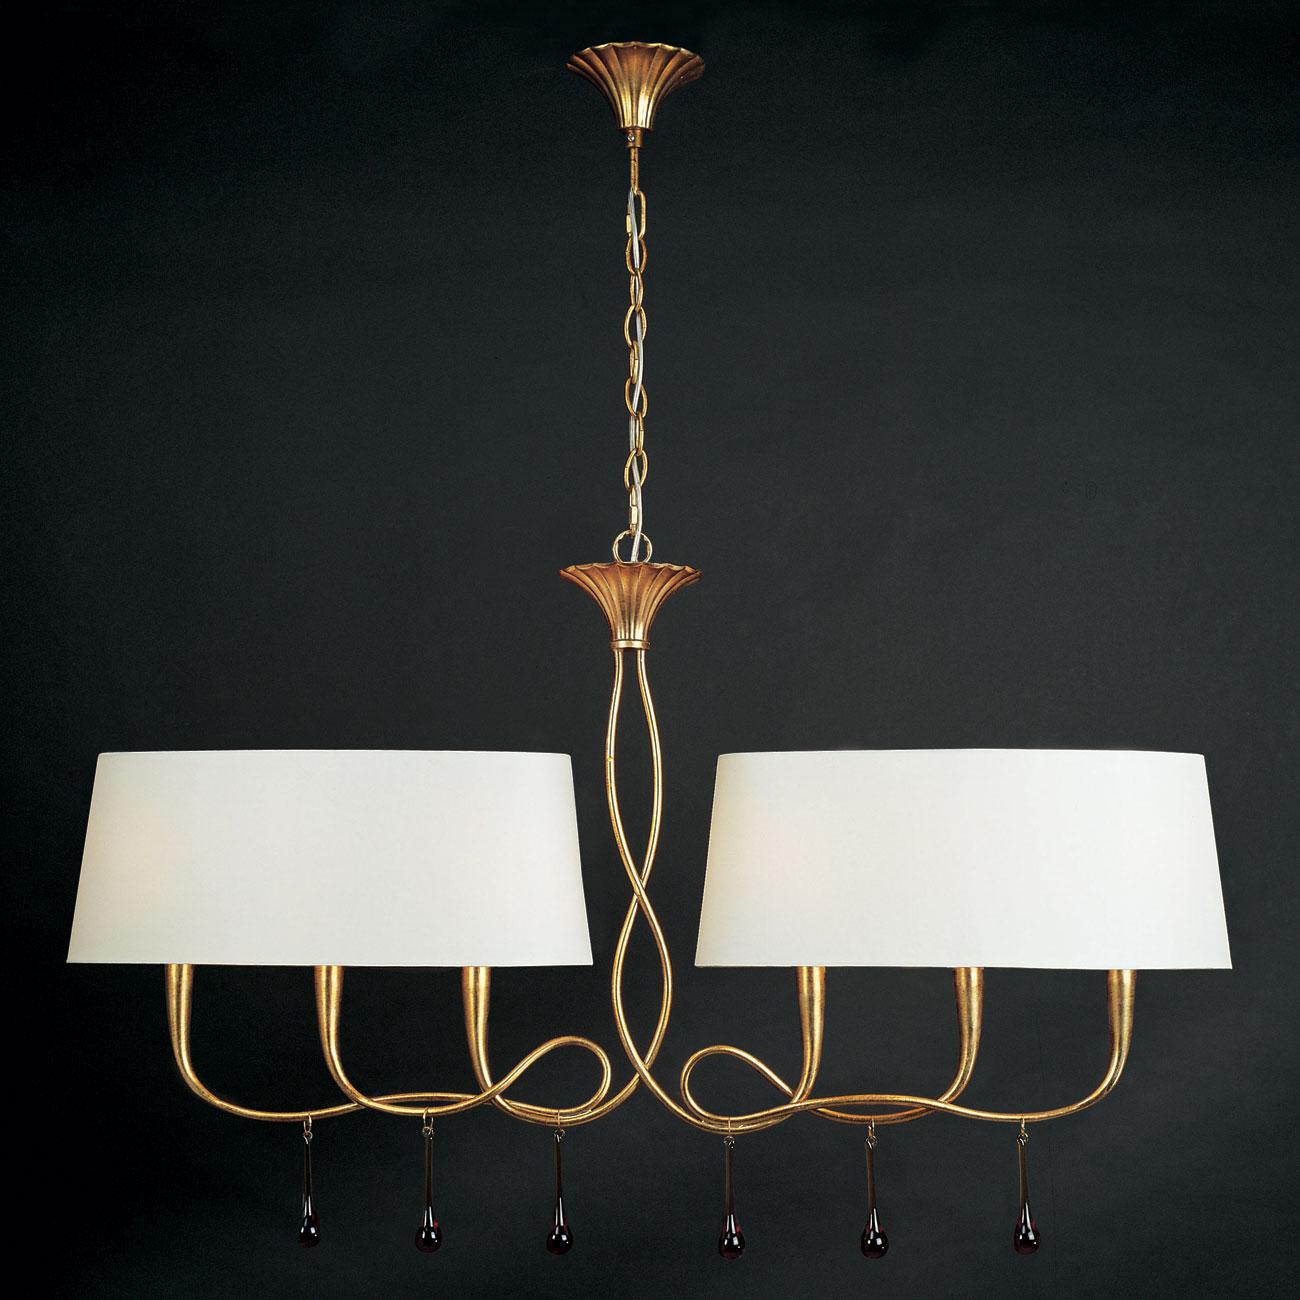 Paola Pendant Lamp 2 arms 6xE14 40w Gold